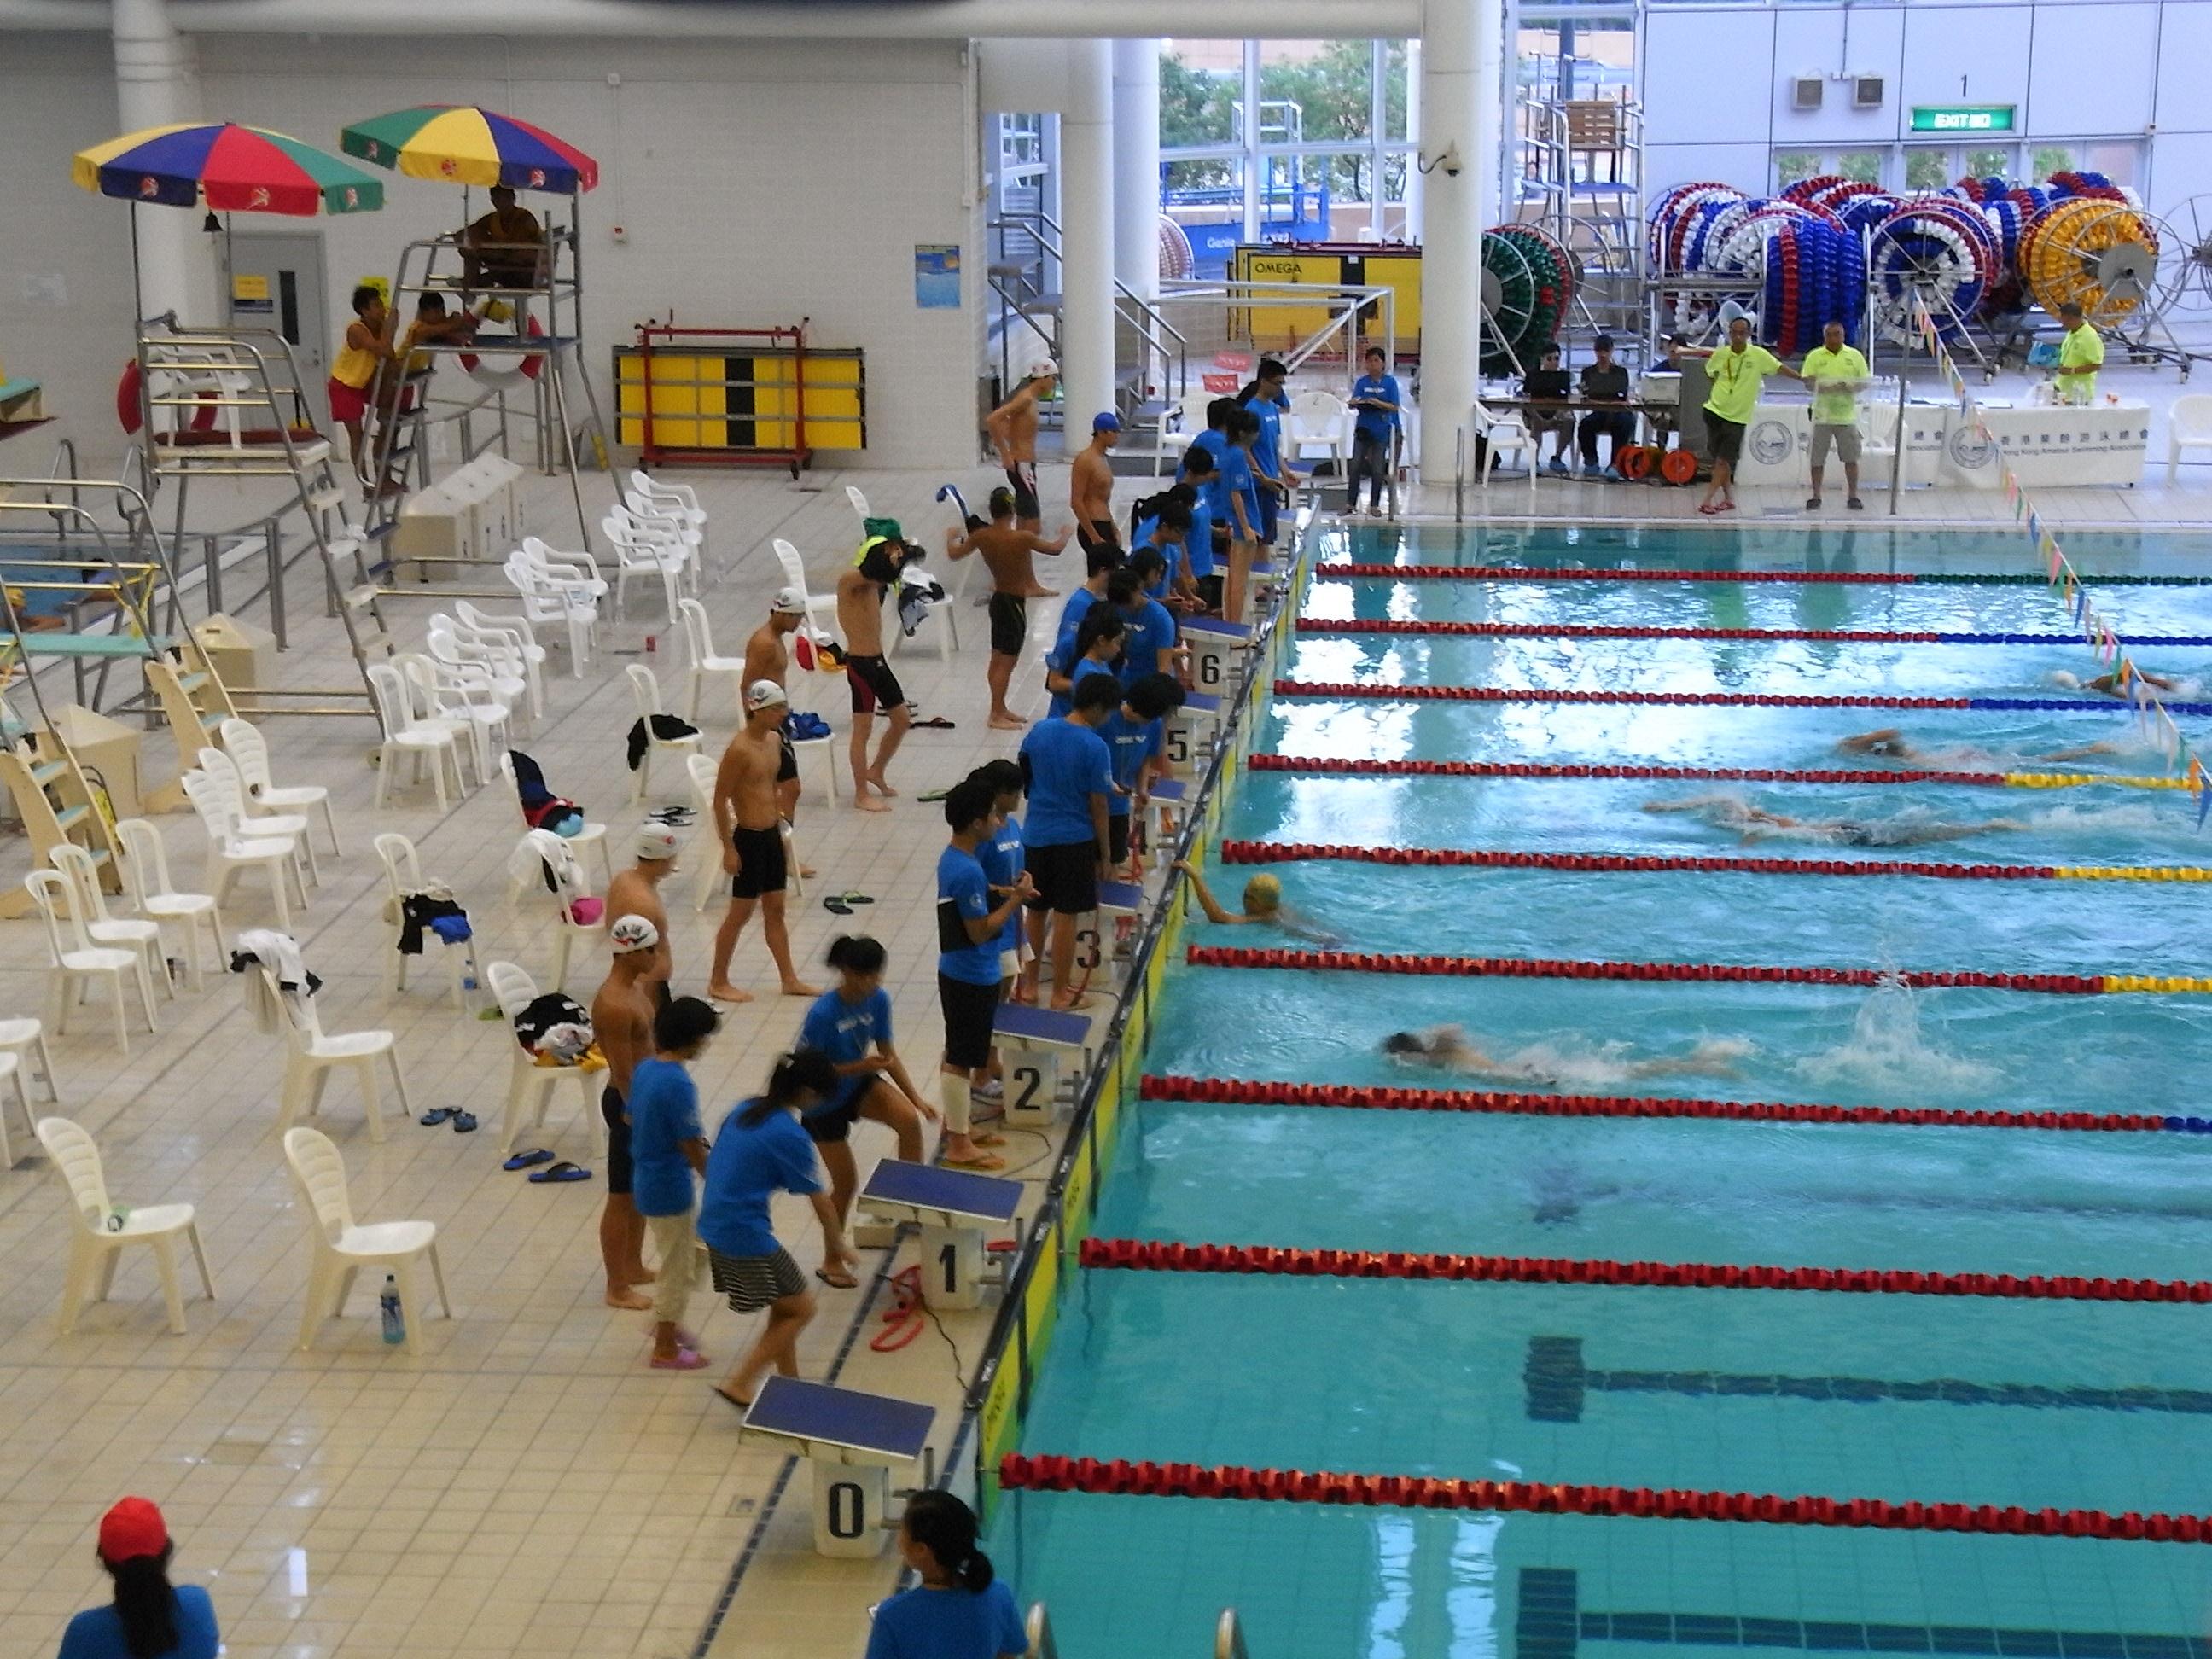 File Hk Tst Kln Park Swimming Pool C2 Indoor Competition July 2012 Jpg